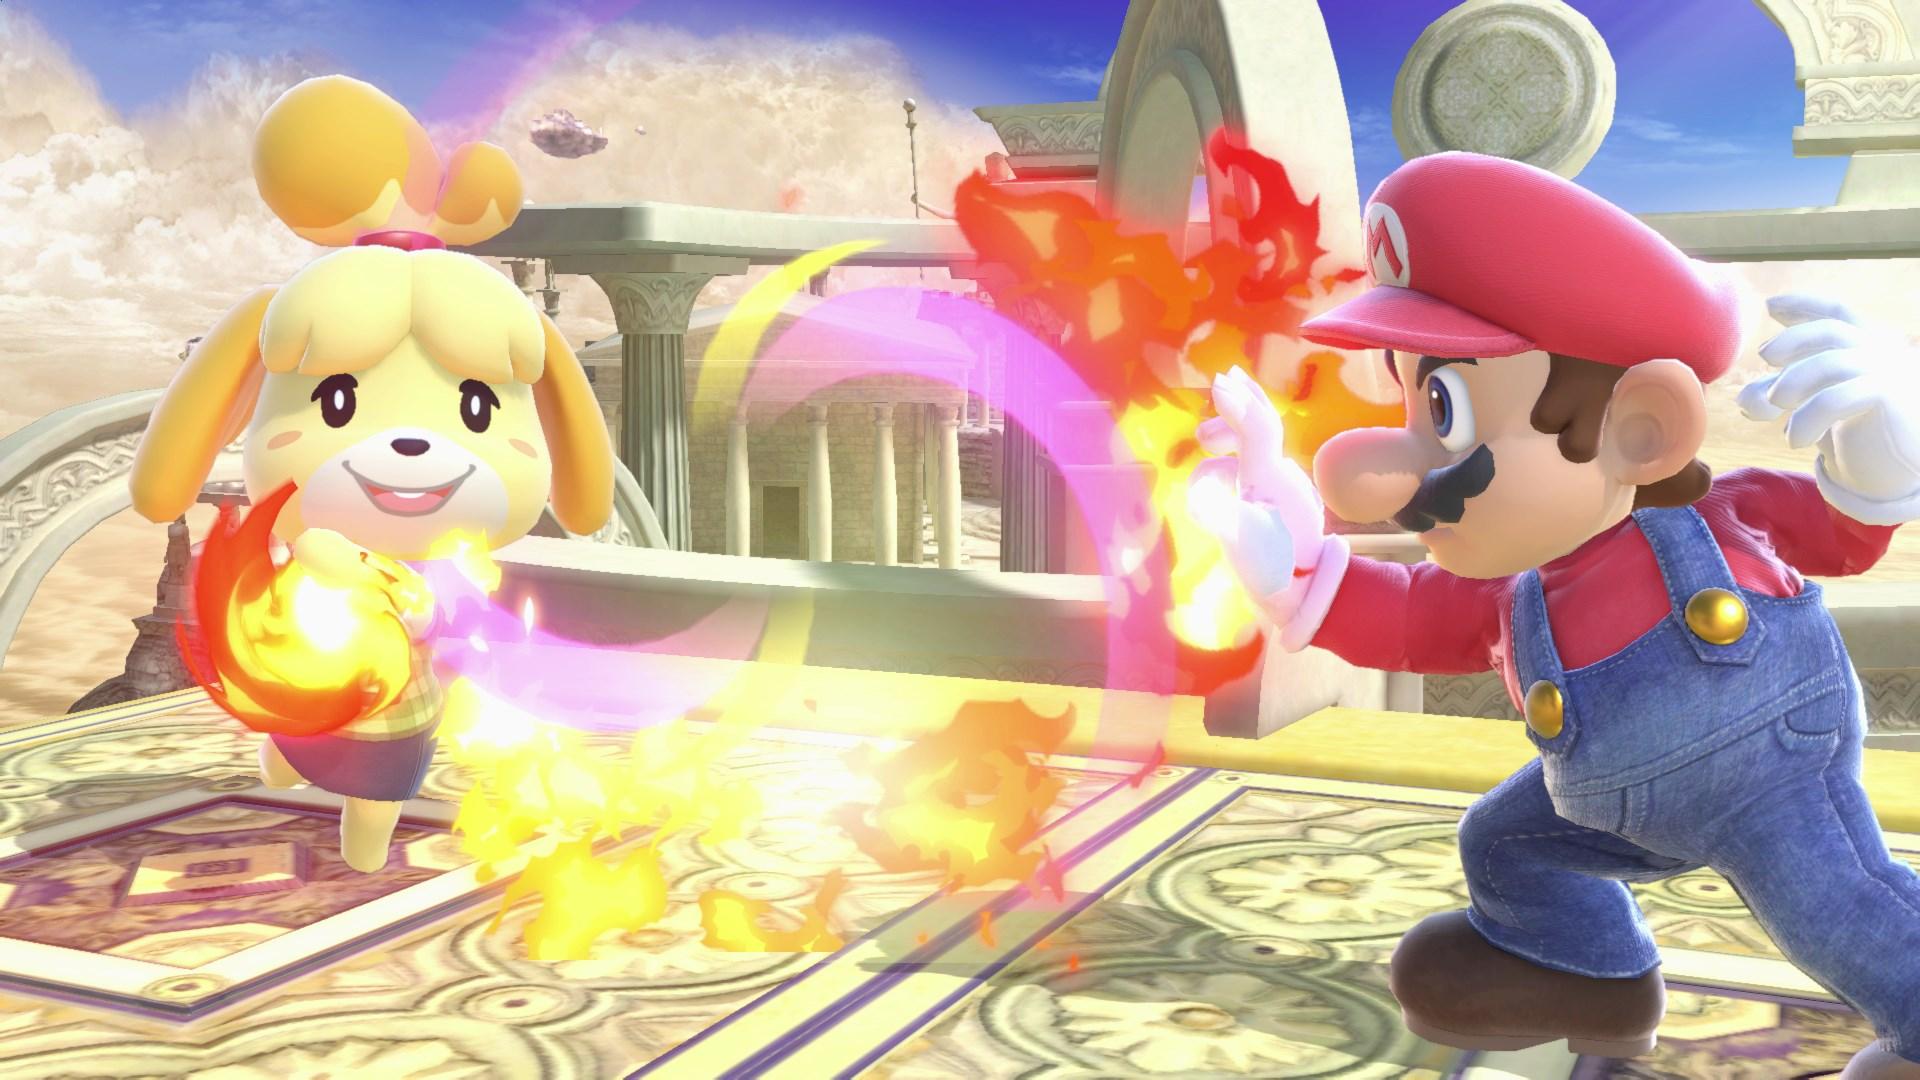 Super Smash Bros. Ultimate 'final' Nintendo Direct airing Nov. 1